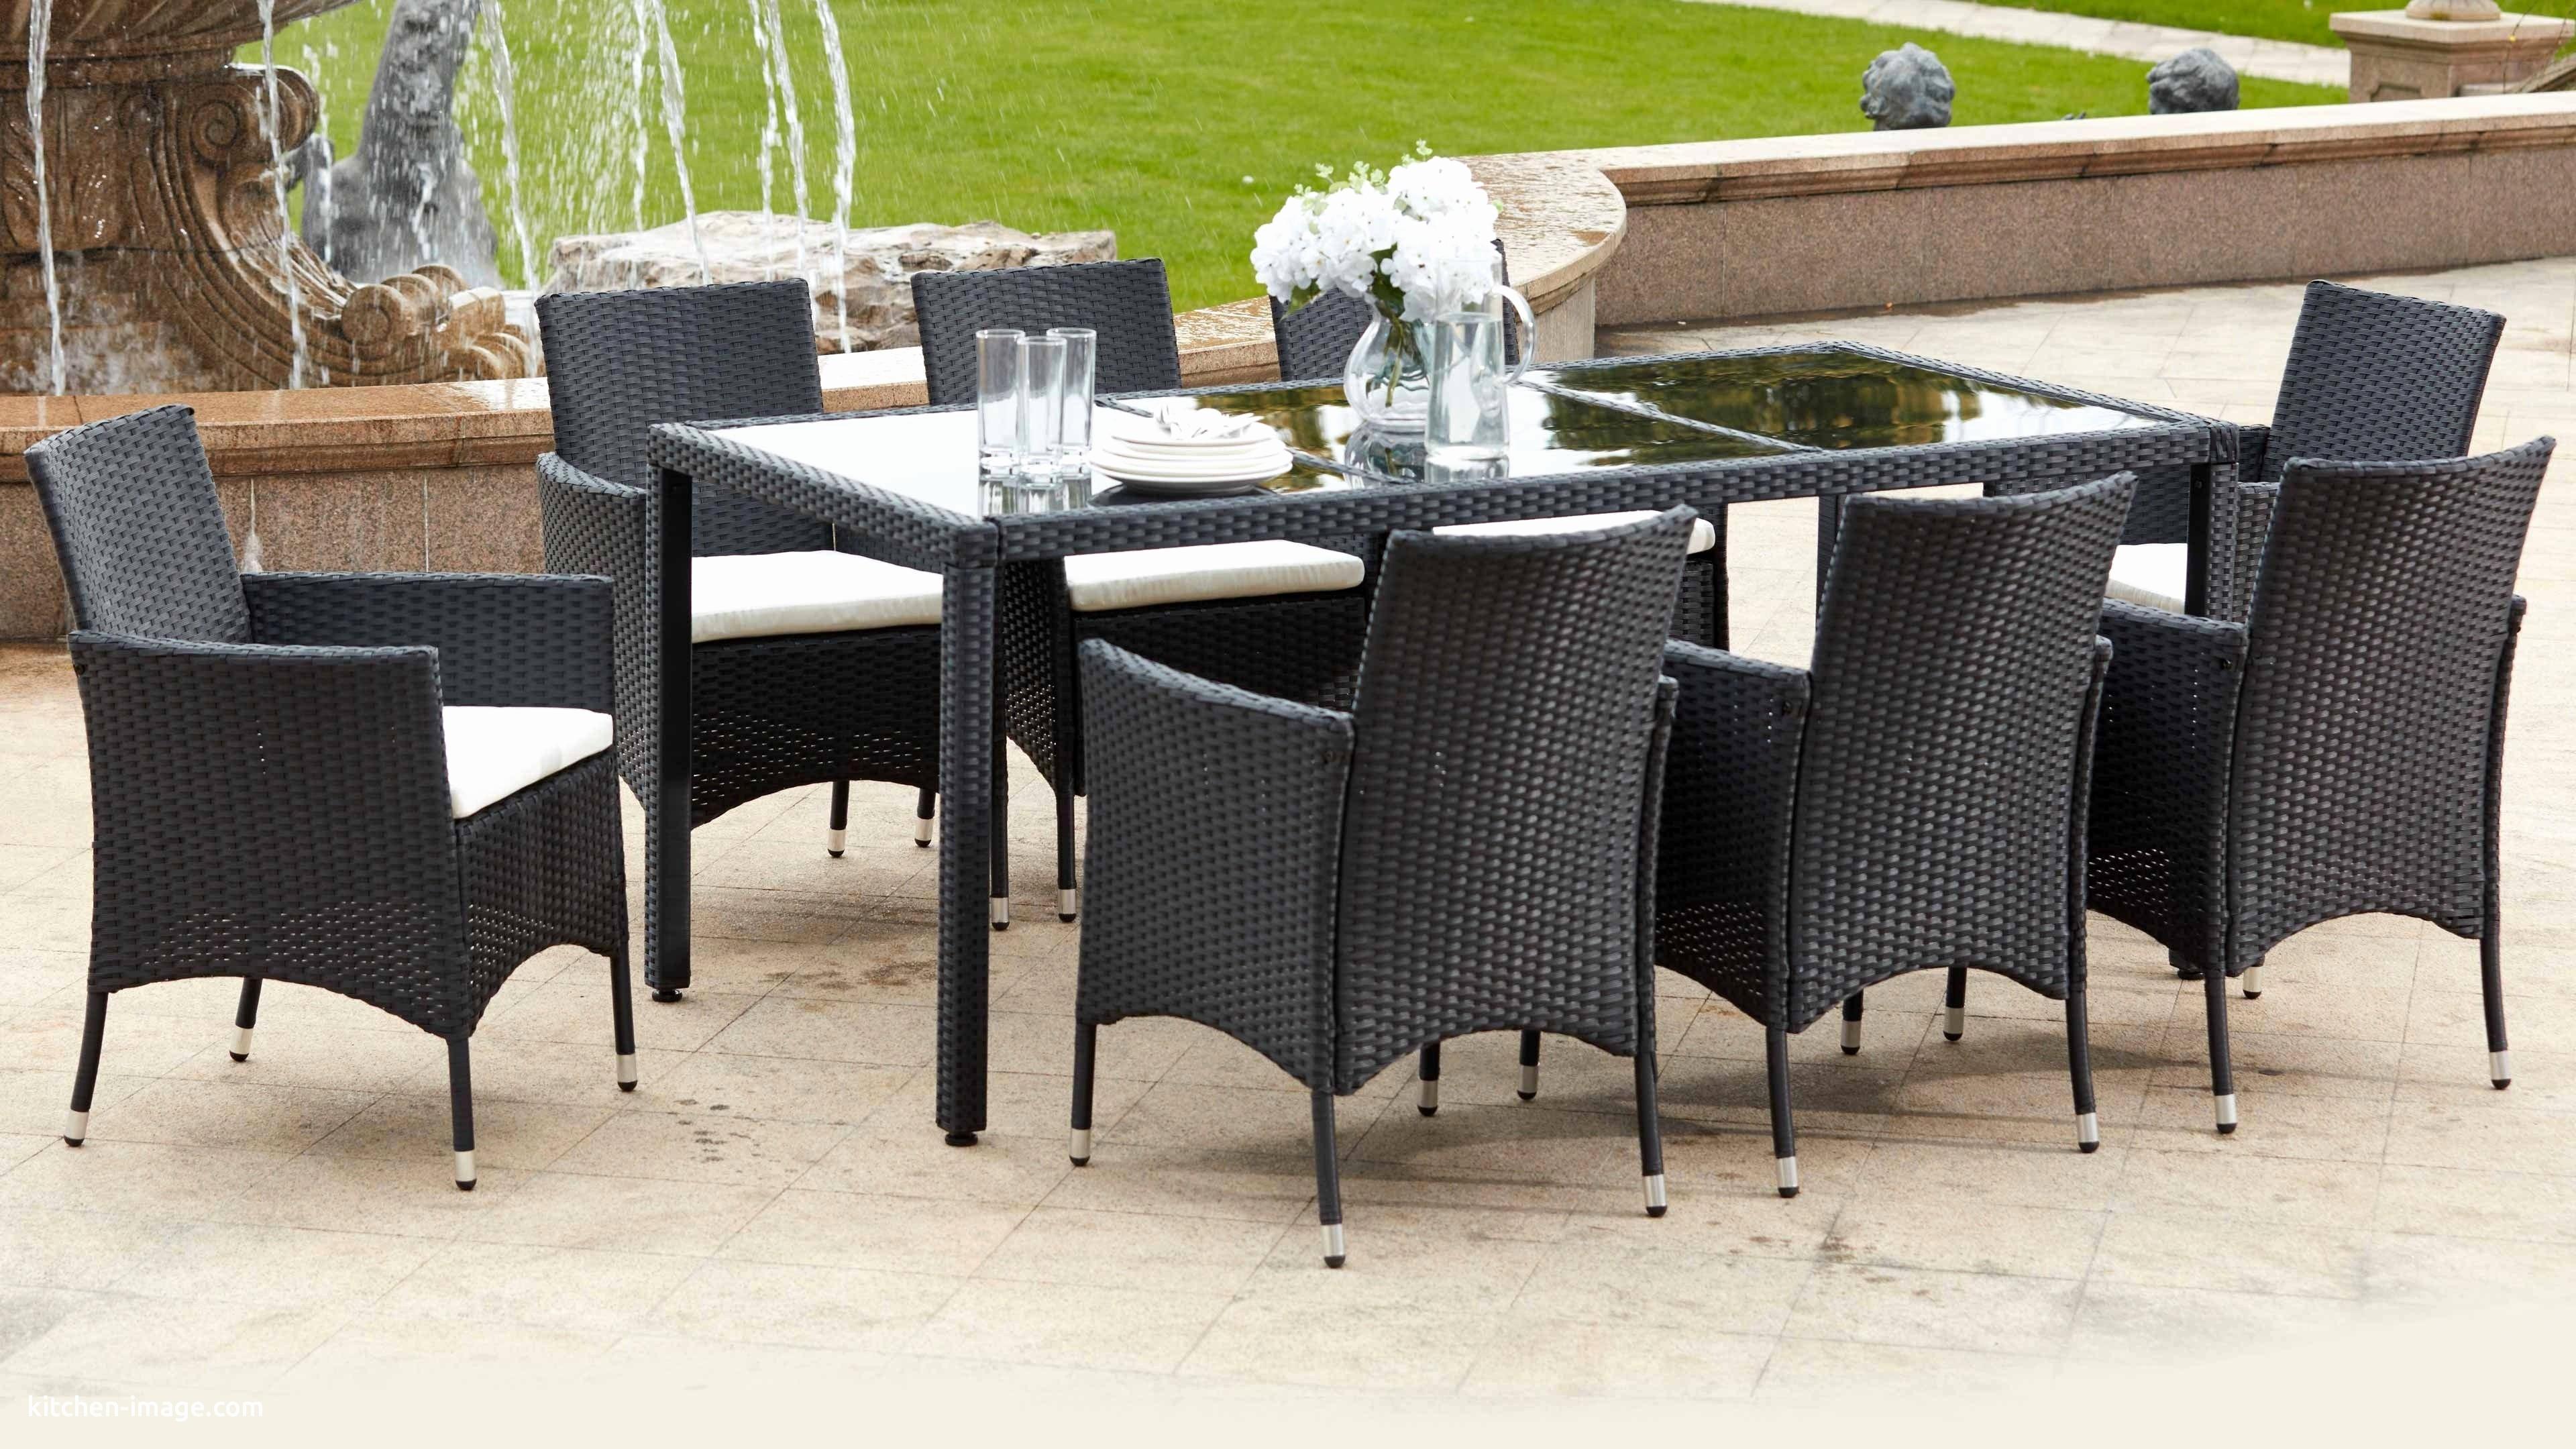 Armoire De Jardin En Bois Ikea Beau Image Lit De Jardin En Bois Aussi Magnifique Table De Lit Design Salon